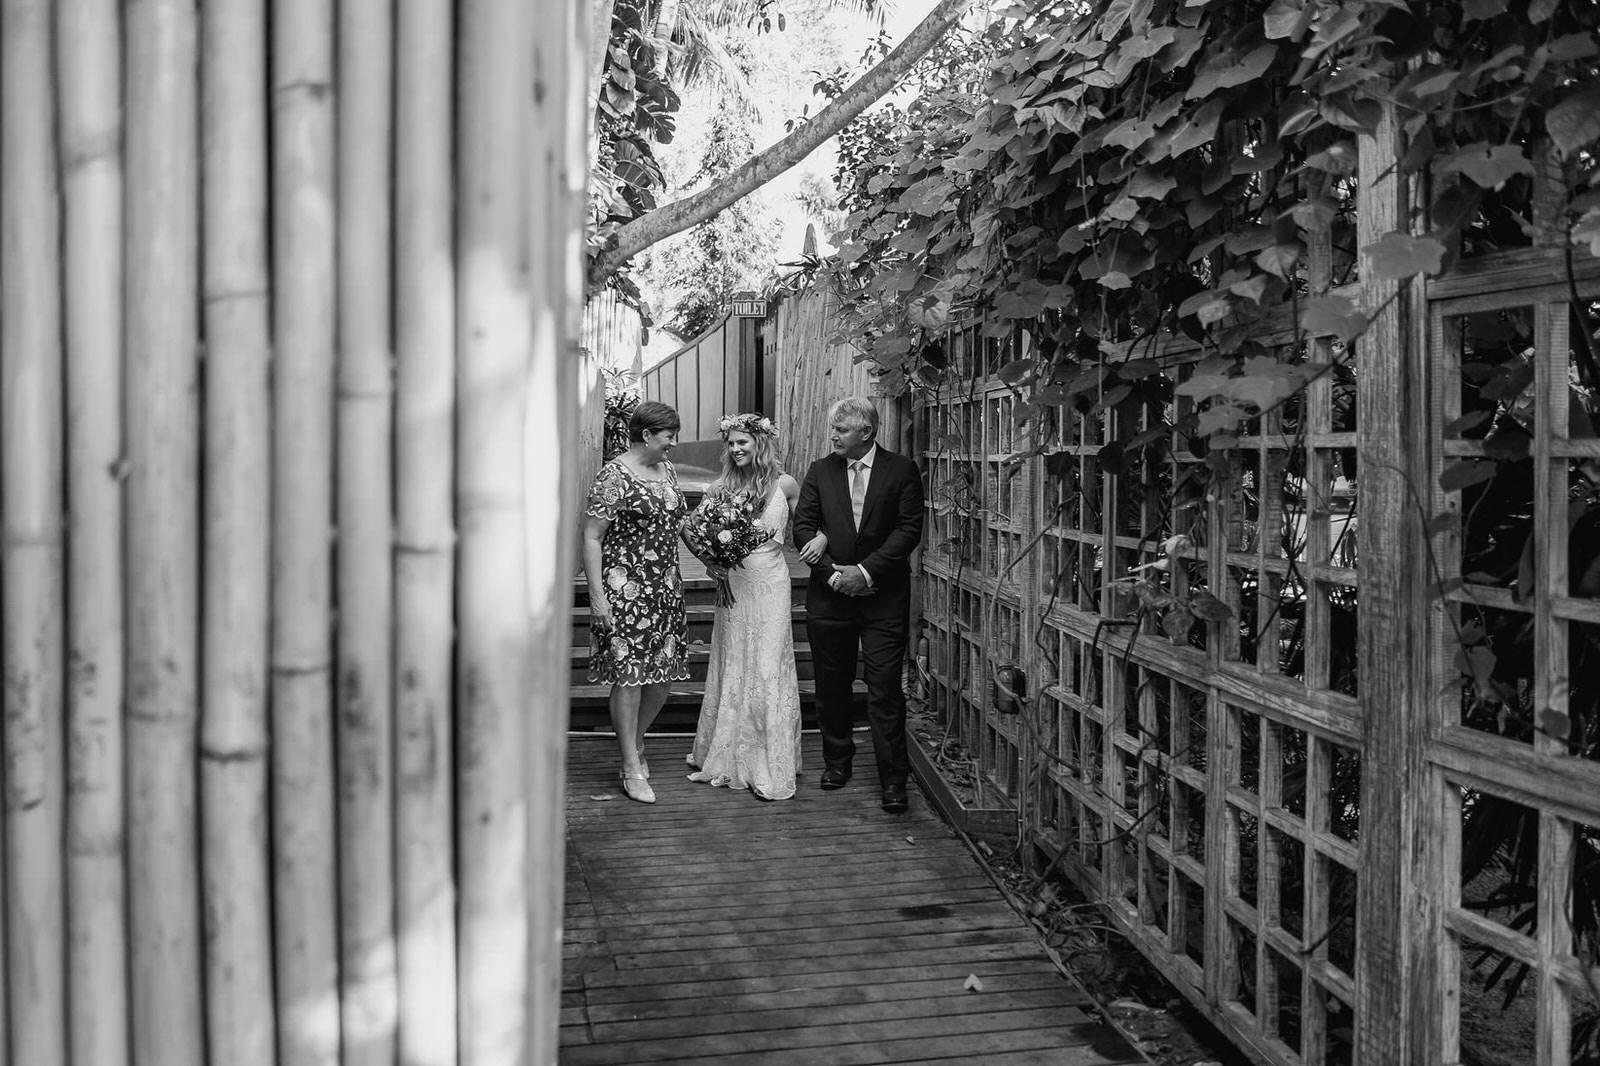 newfound-hai-tide-nusa-lembongan-bali-wedding-photographers-107